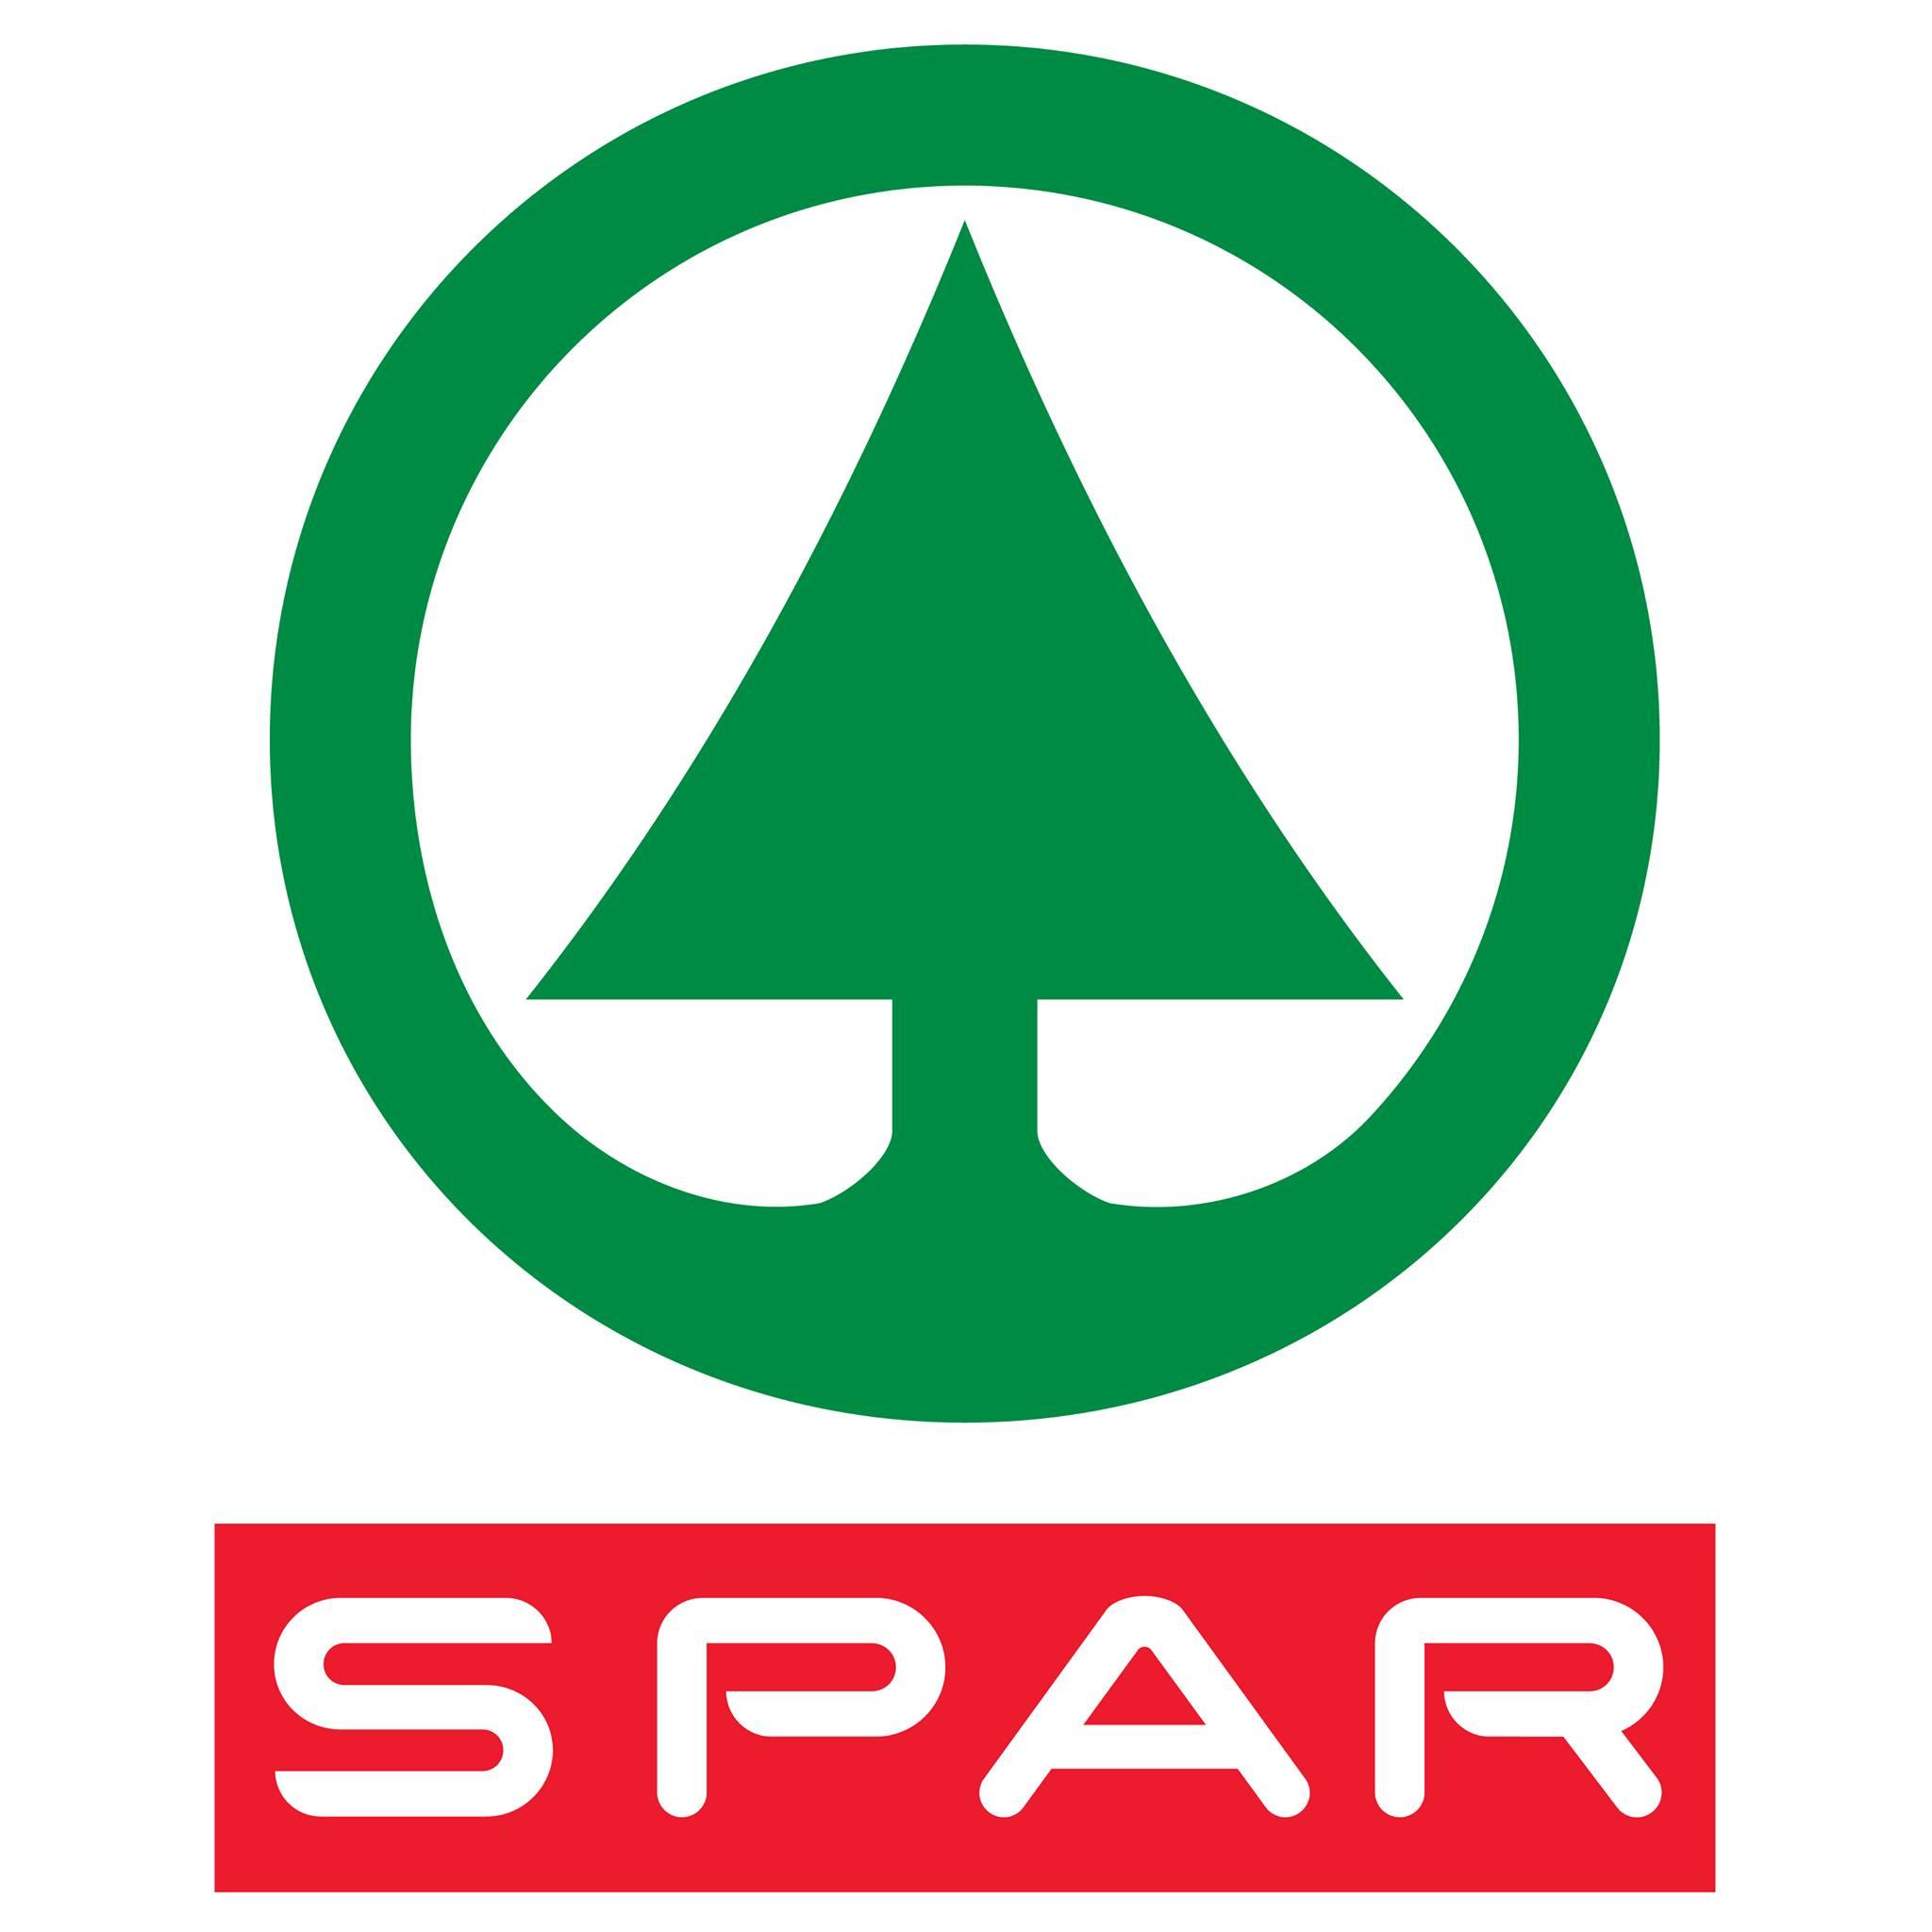 10% cashback at SPAR through Santander/Halifax rewards - good for Amazon Top Up